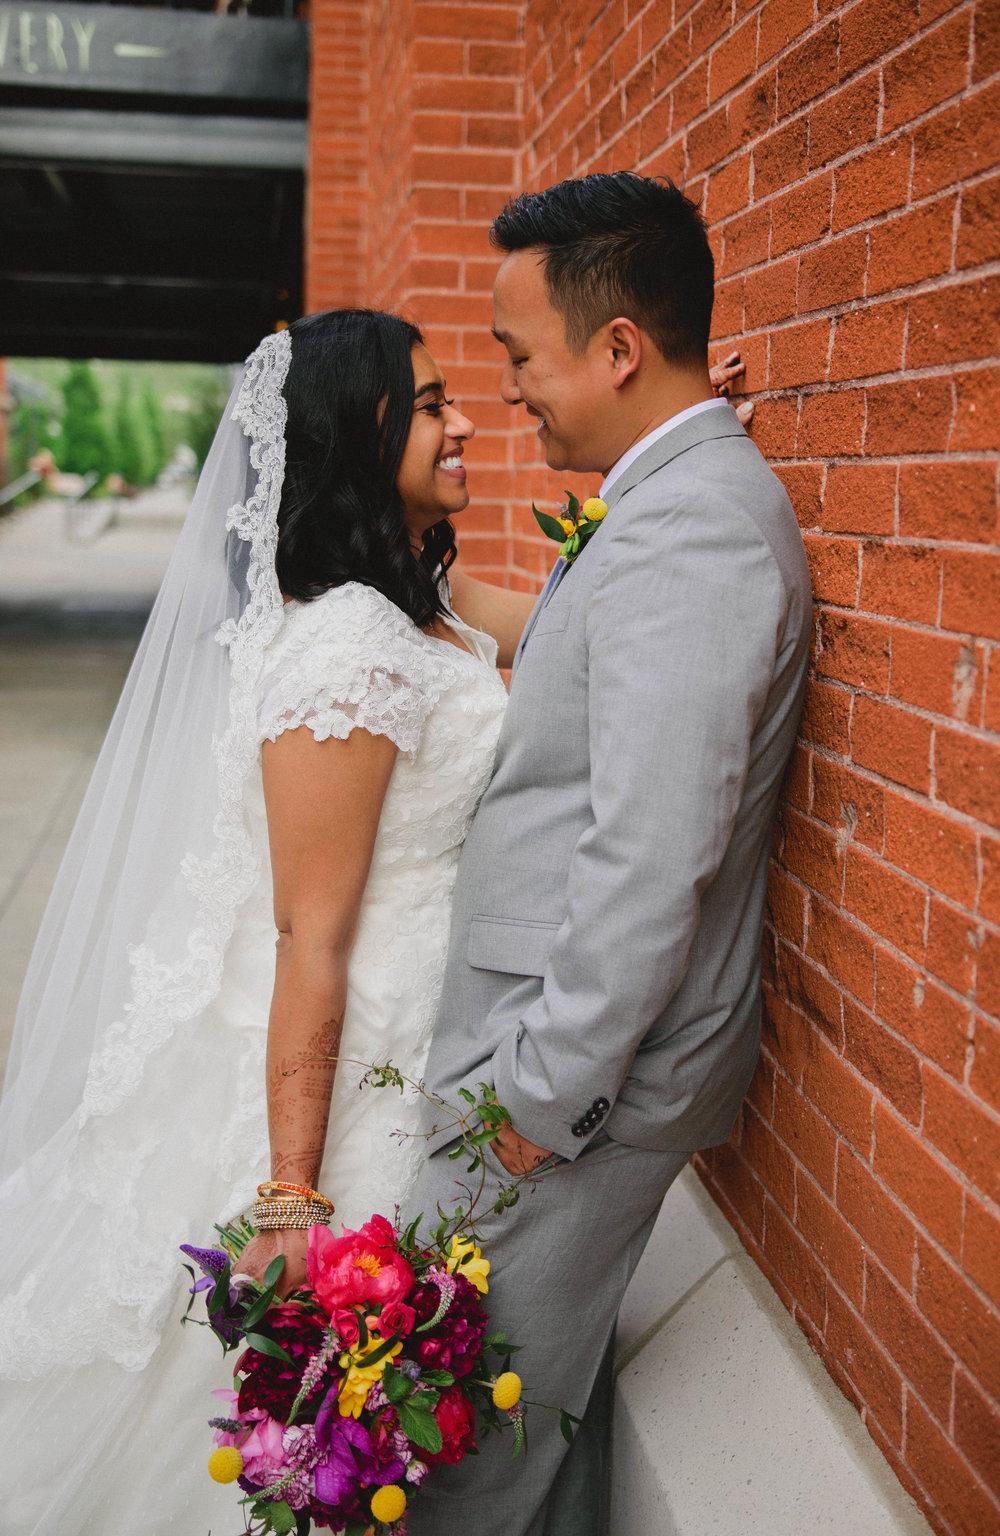 RnP+Lim+Wedding+(163).jpg